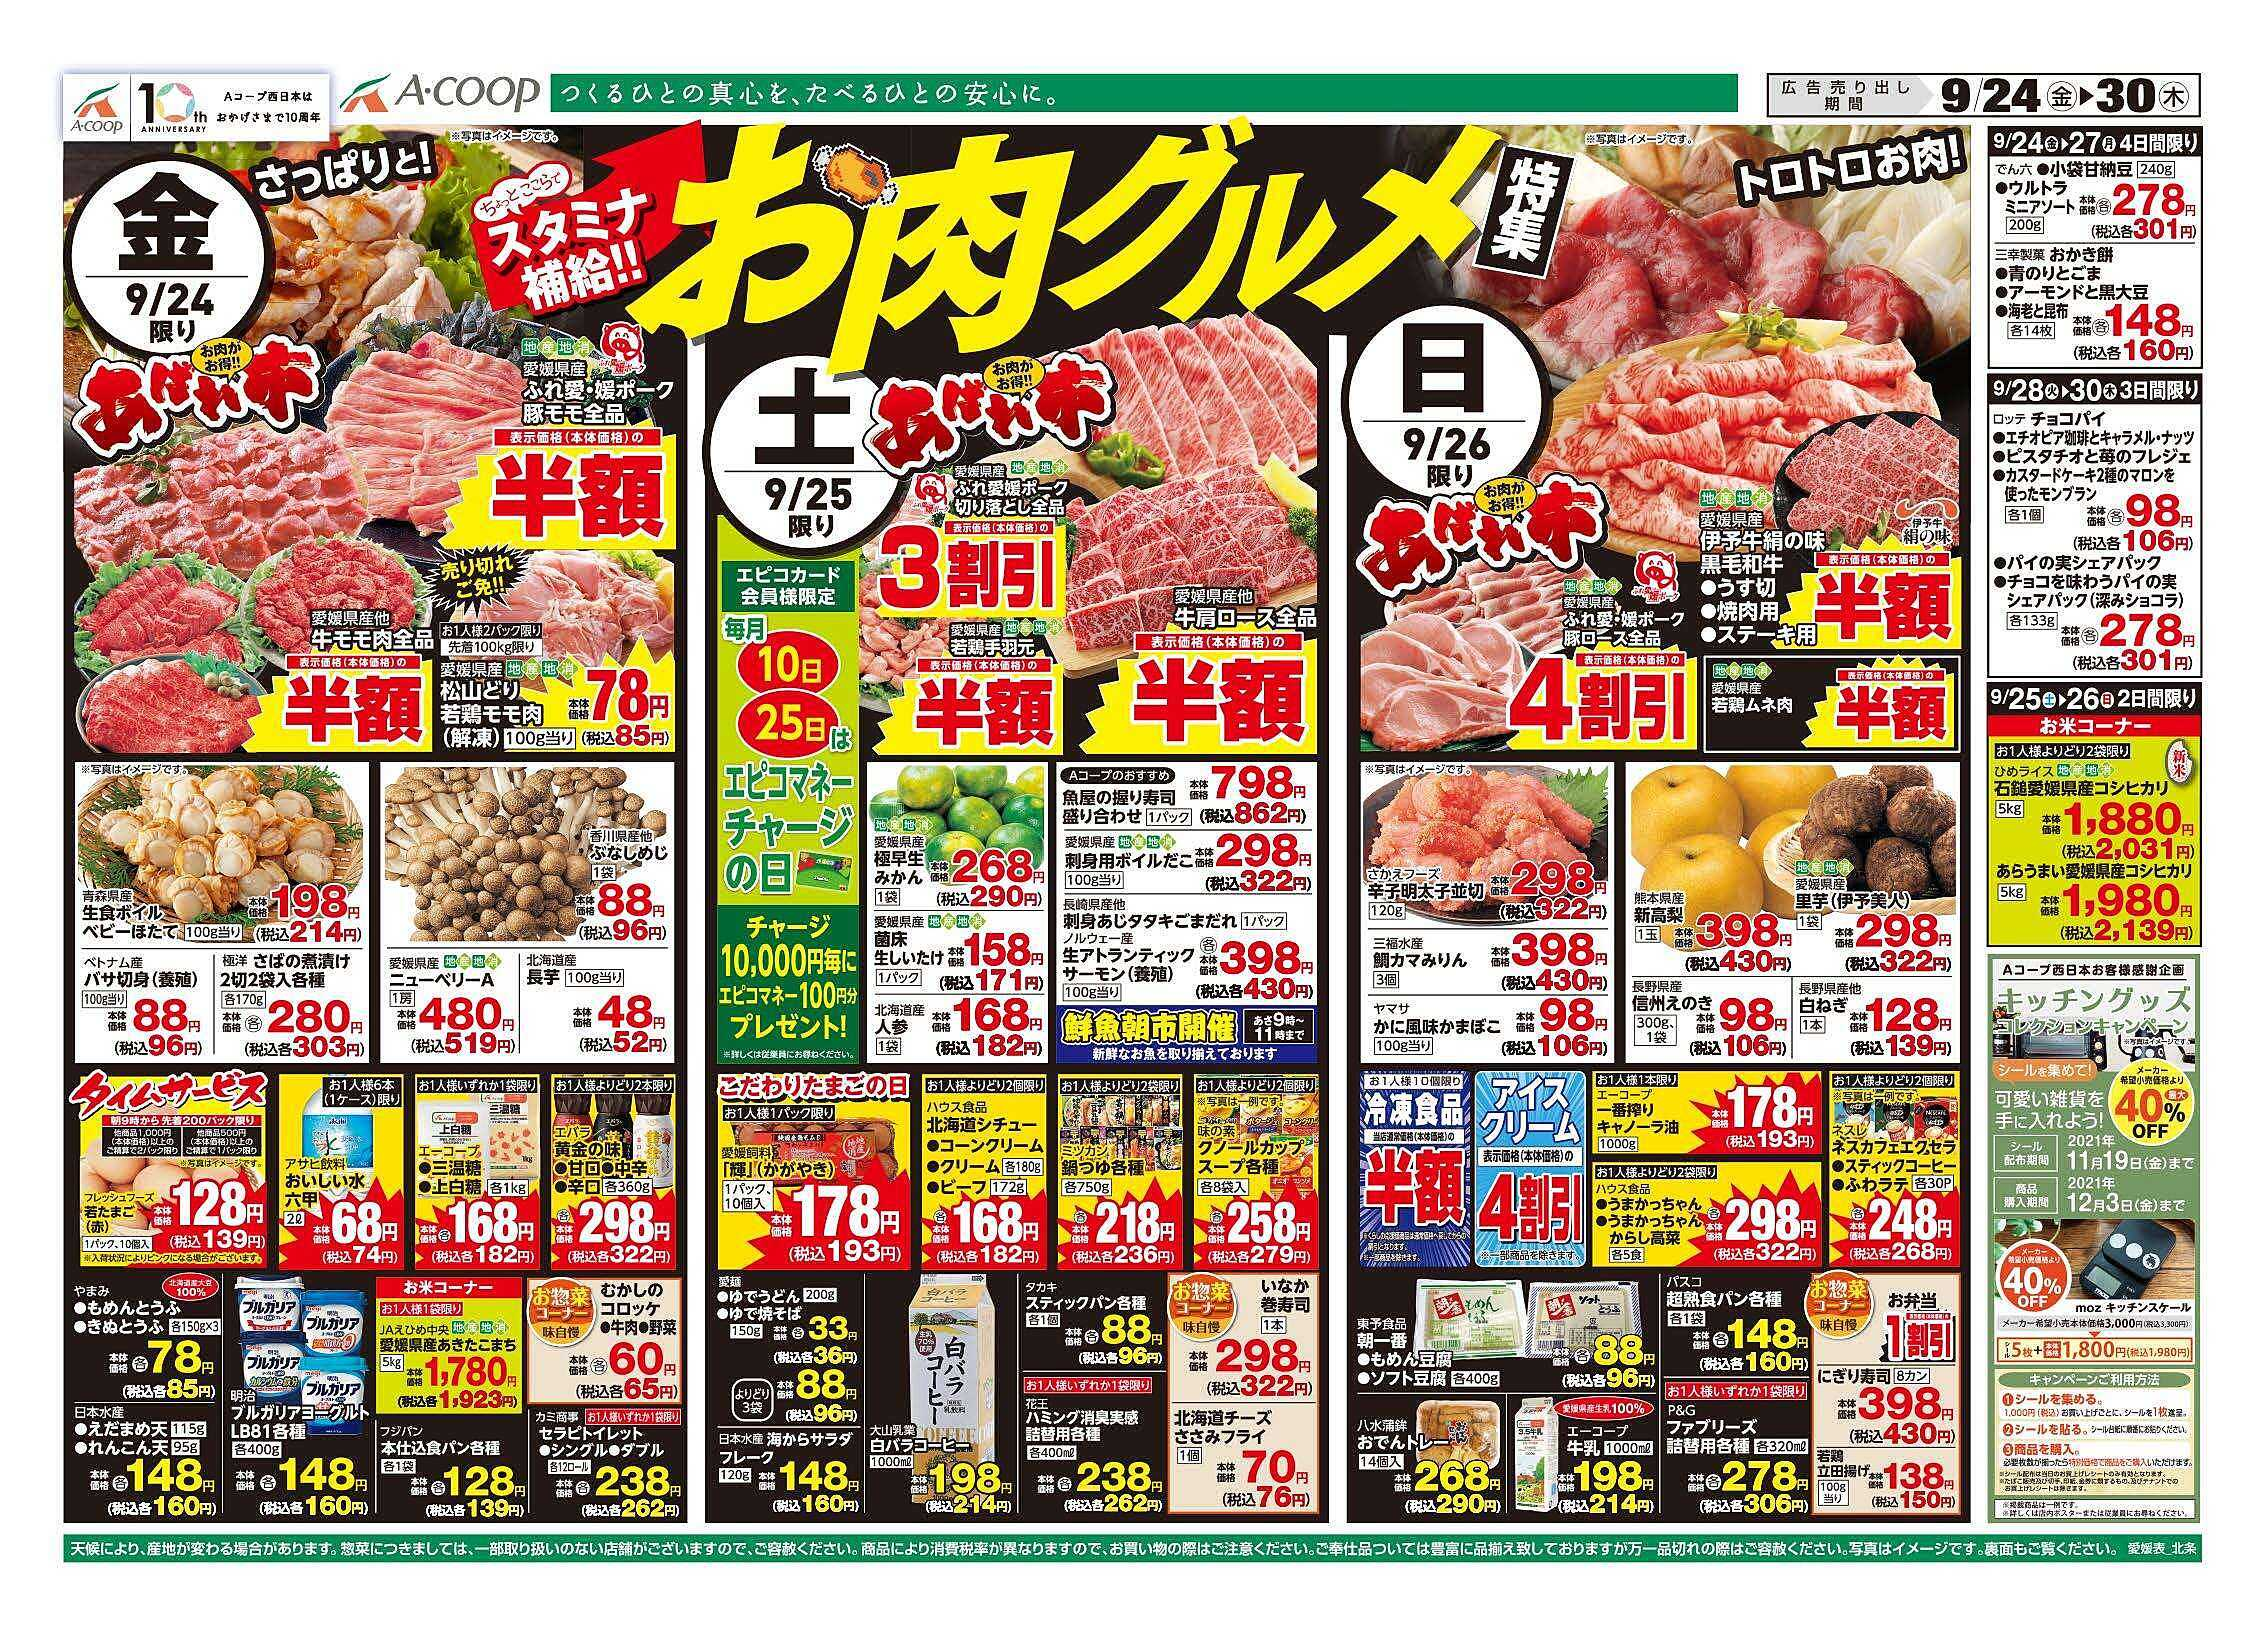 Aコープ西日本 9/24(金)~9/30(木)